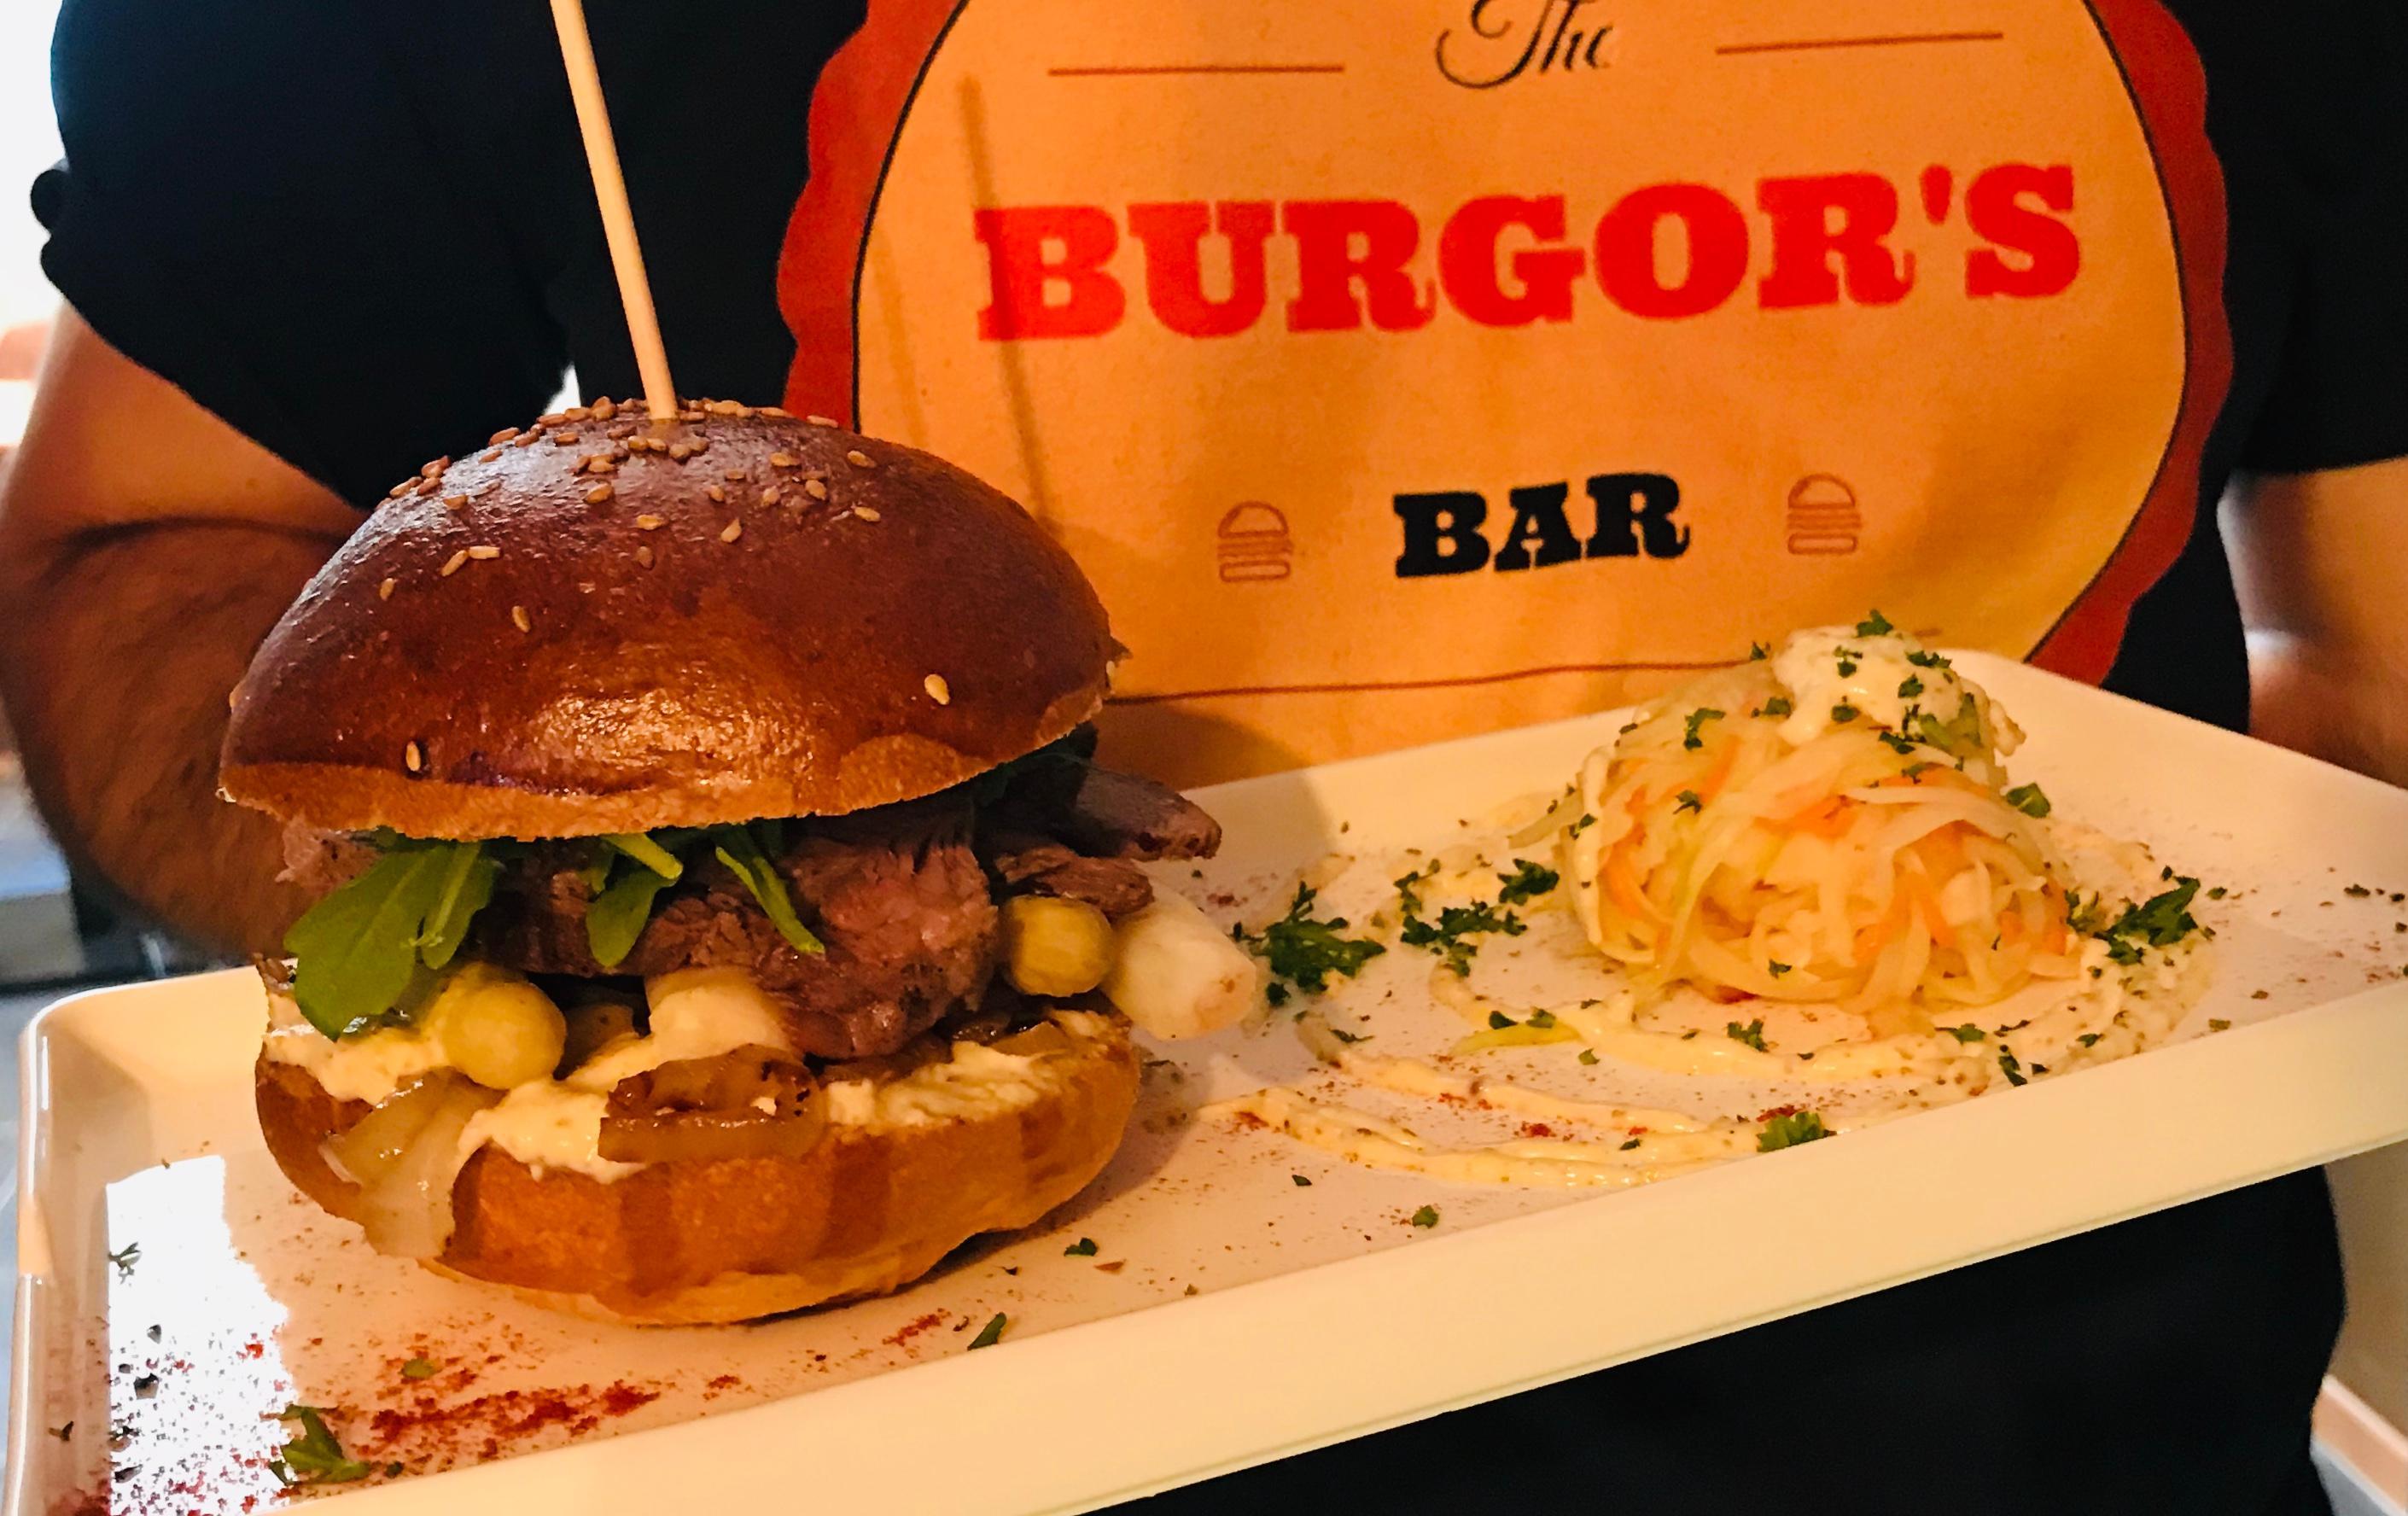 The BurGor's Bar